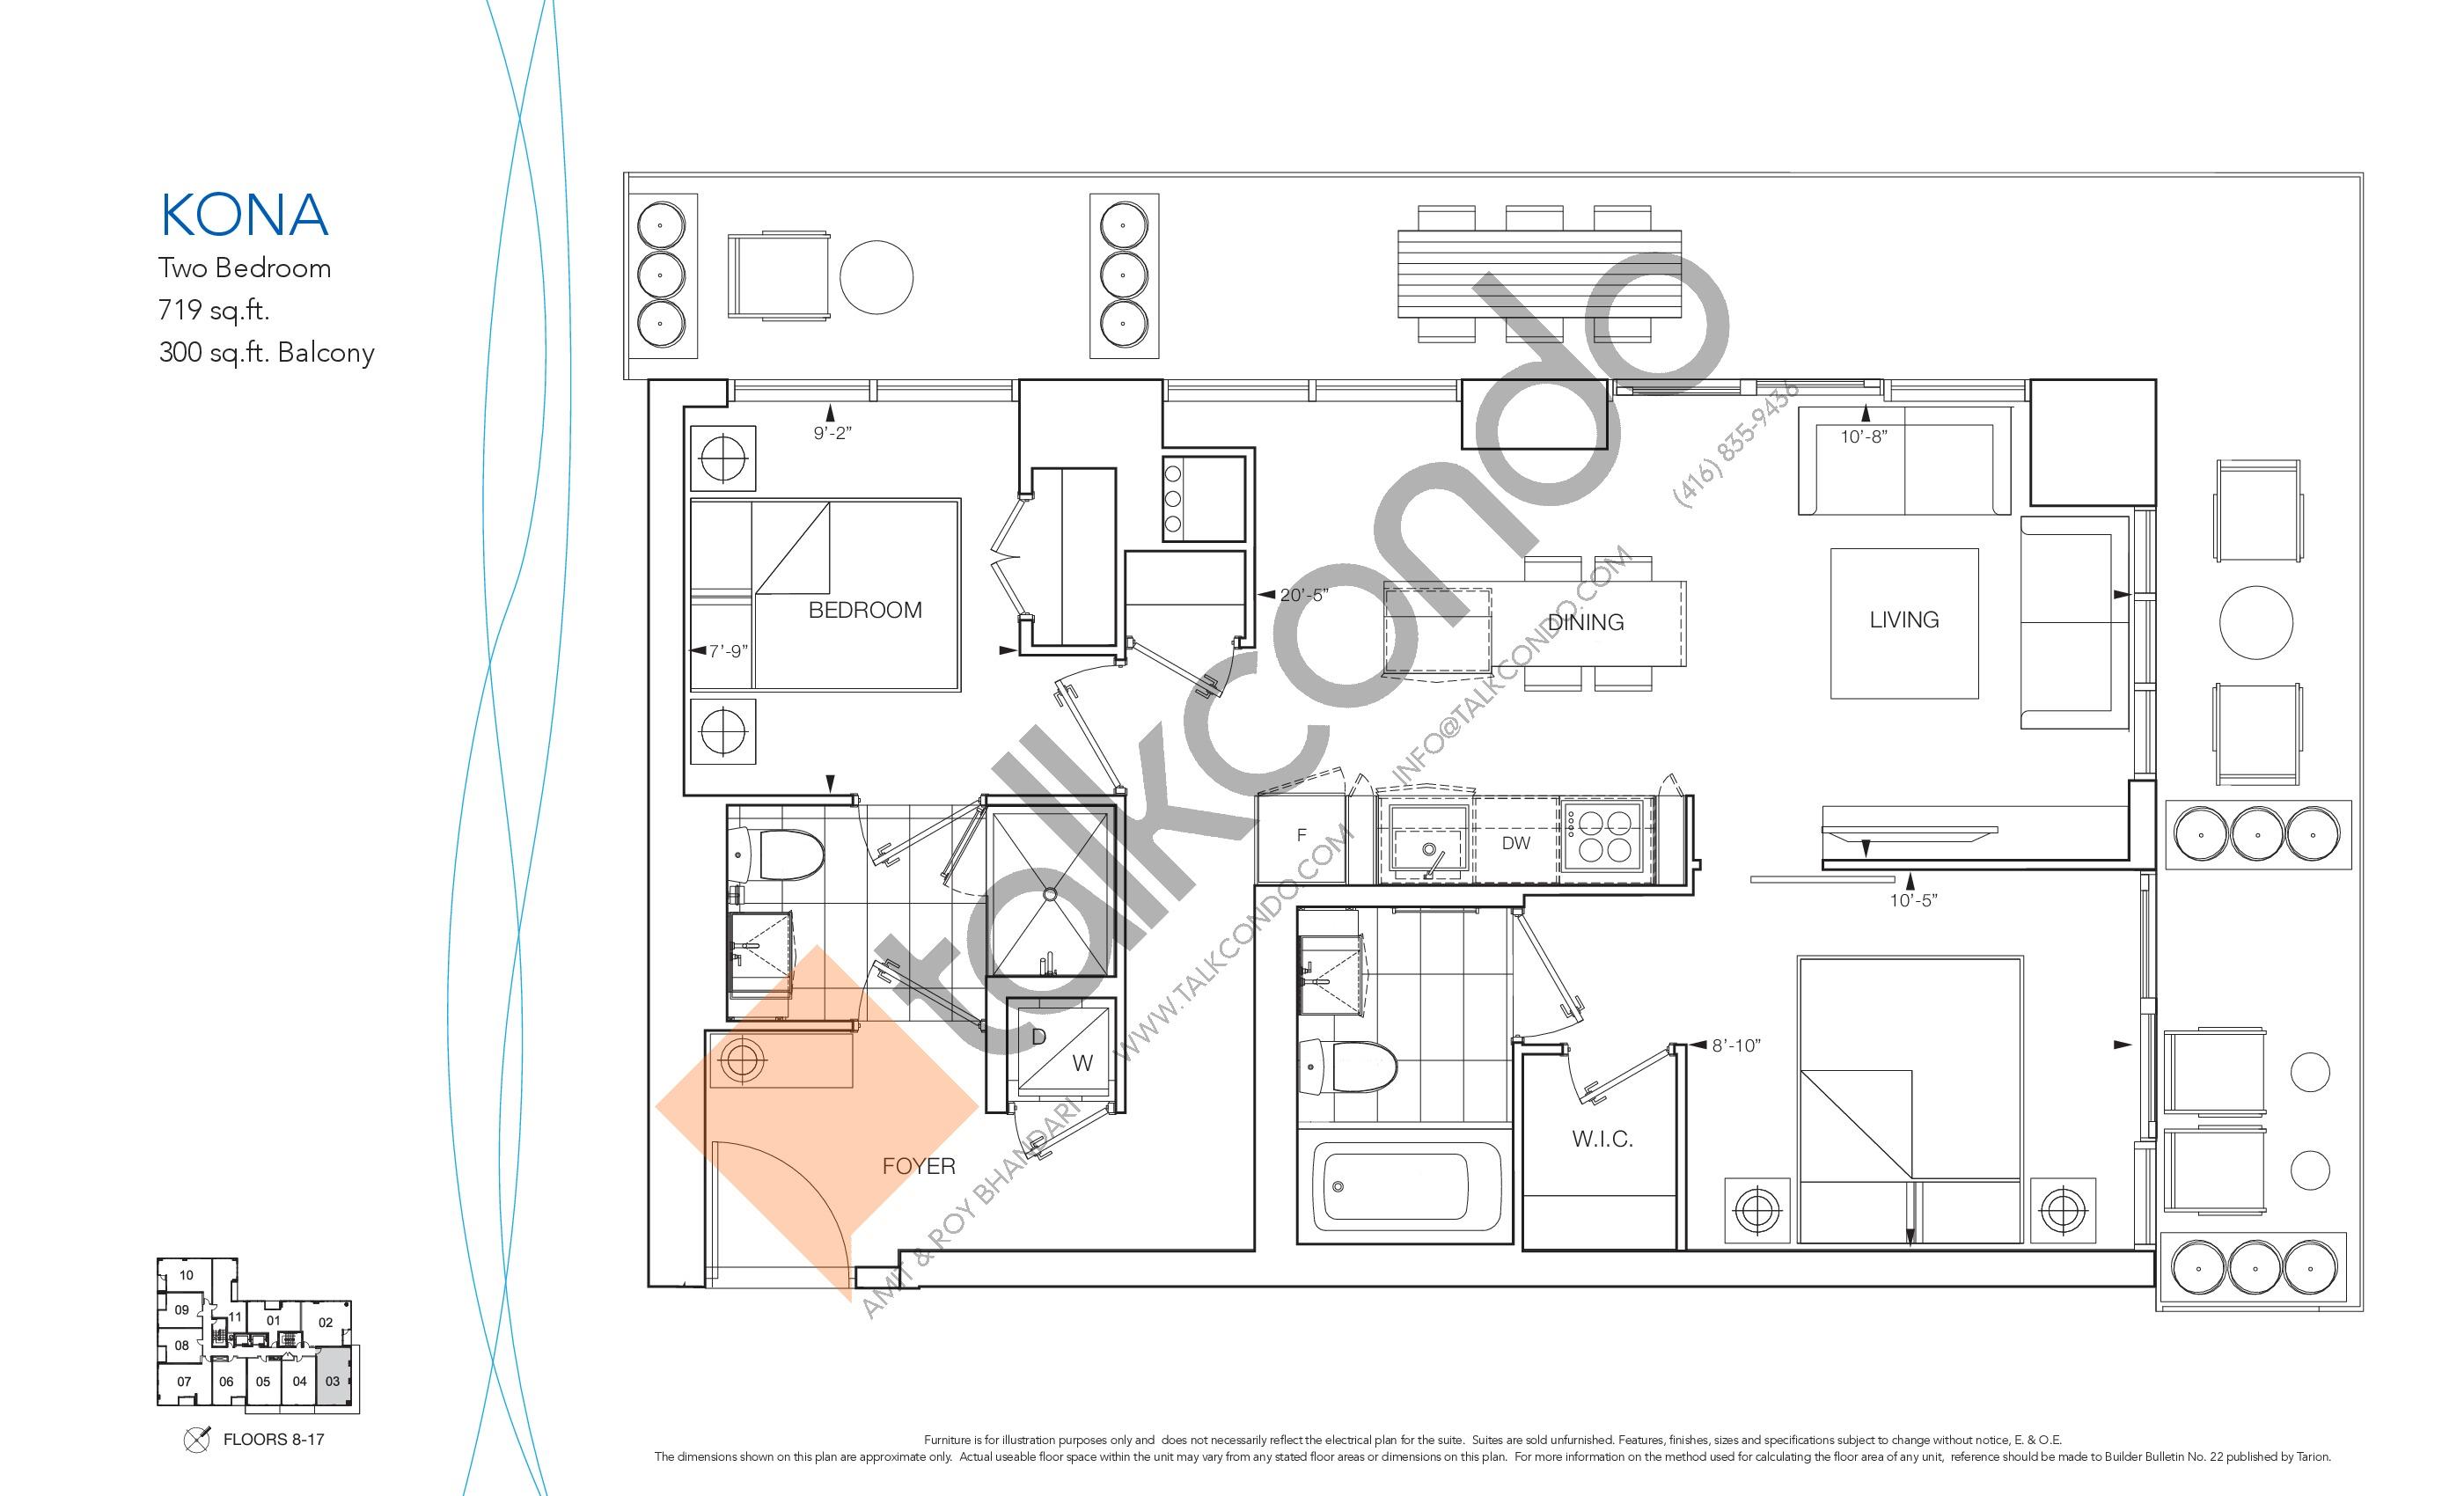 Kona Floor Plan at Nautique Lakefront Residences - 719 sq.ft